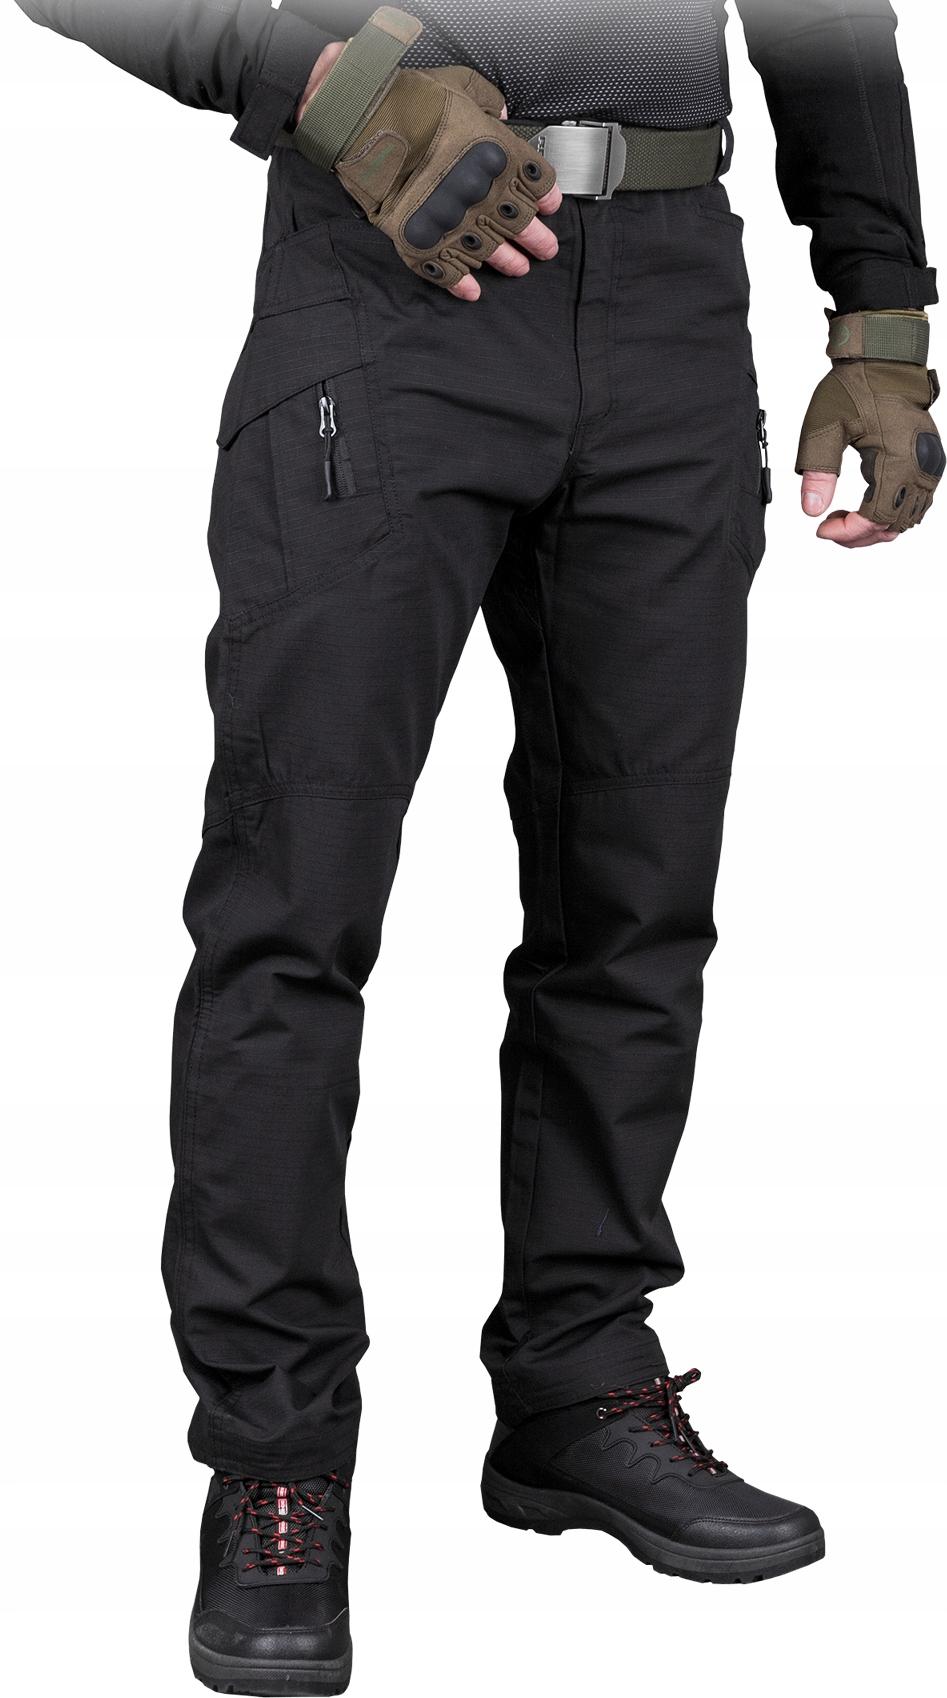 Tactical Guard XL защитные брюки